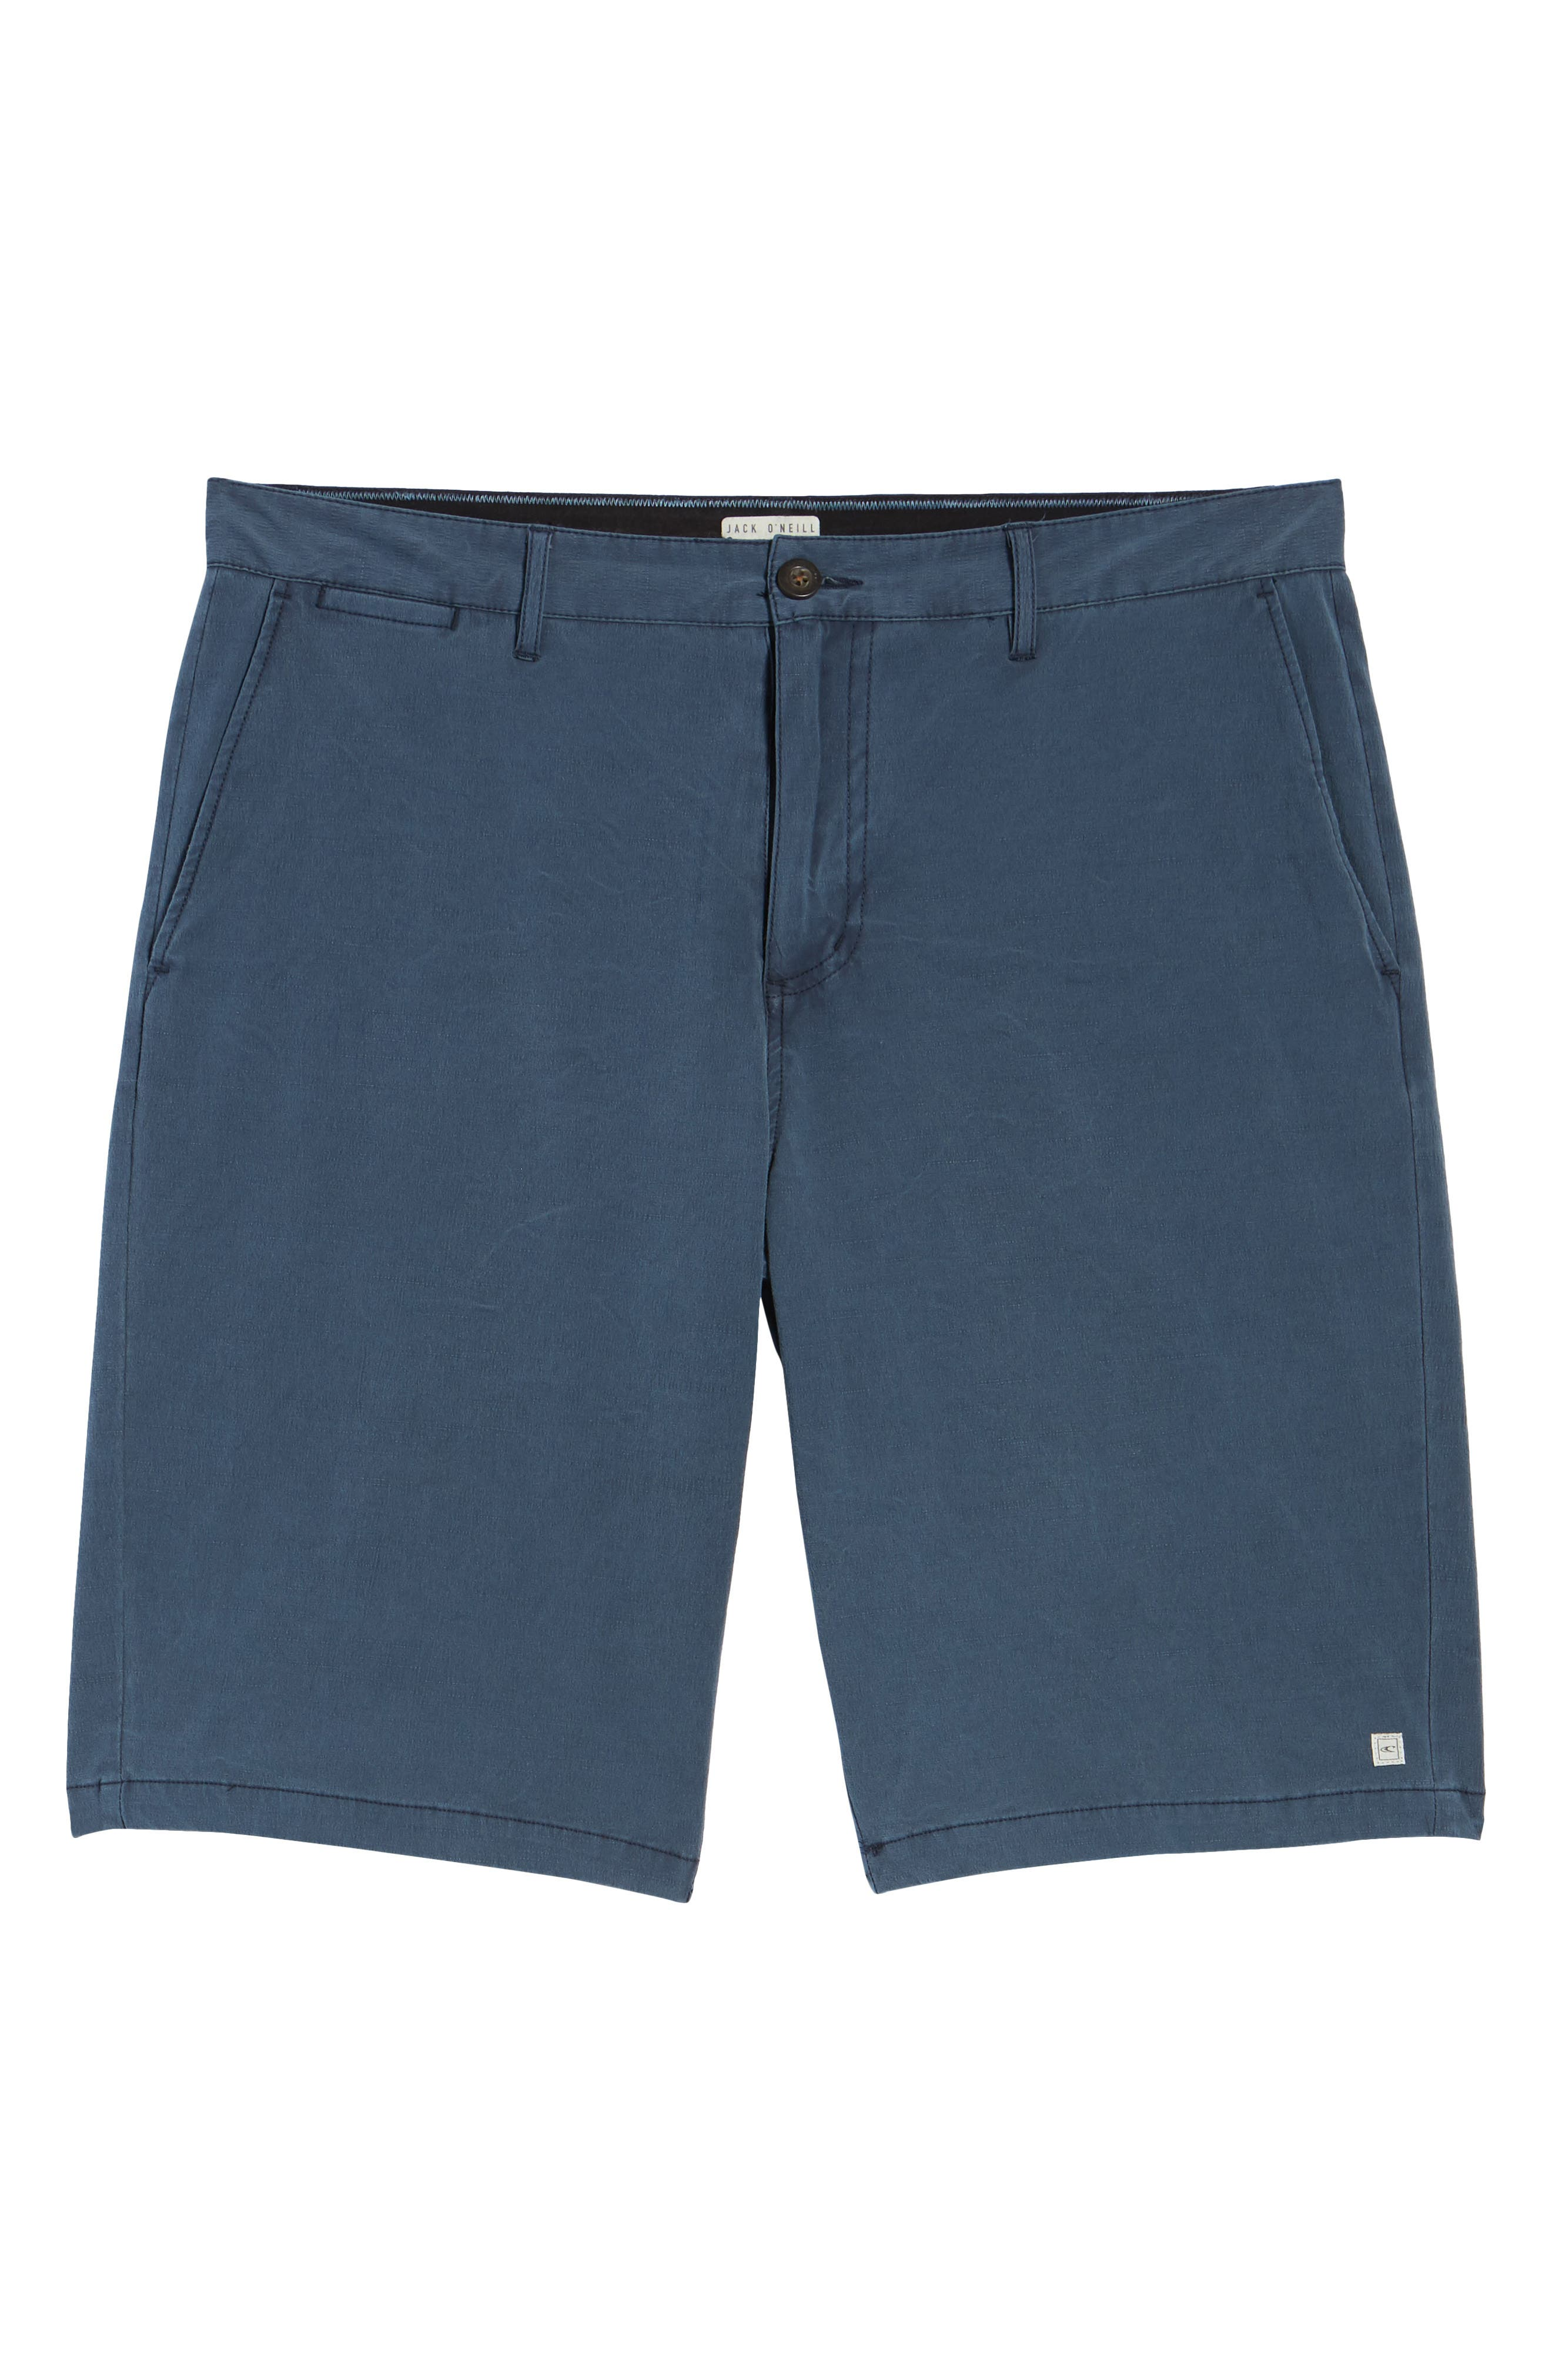 Coast Stretch Board Shorts,                             Alternate thumbnail 6, color,                             Navy